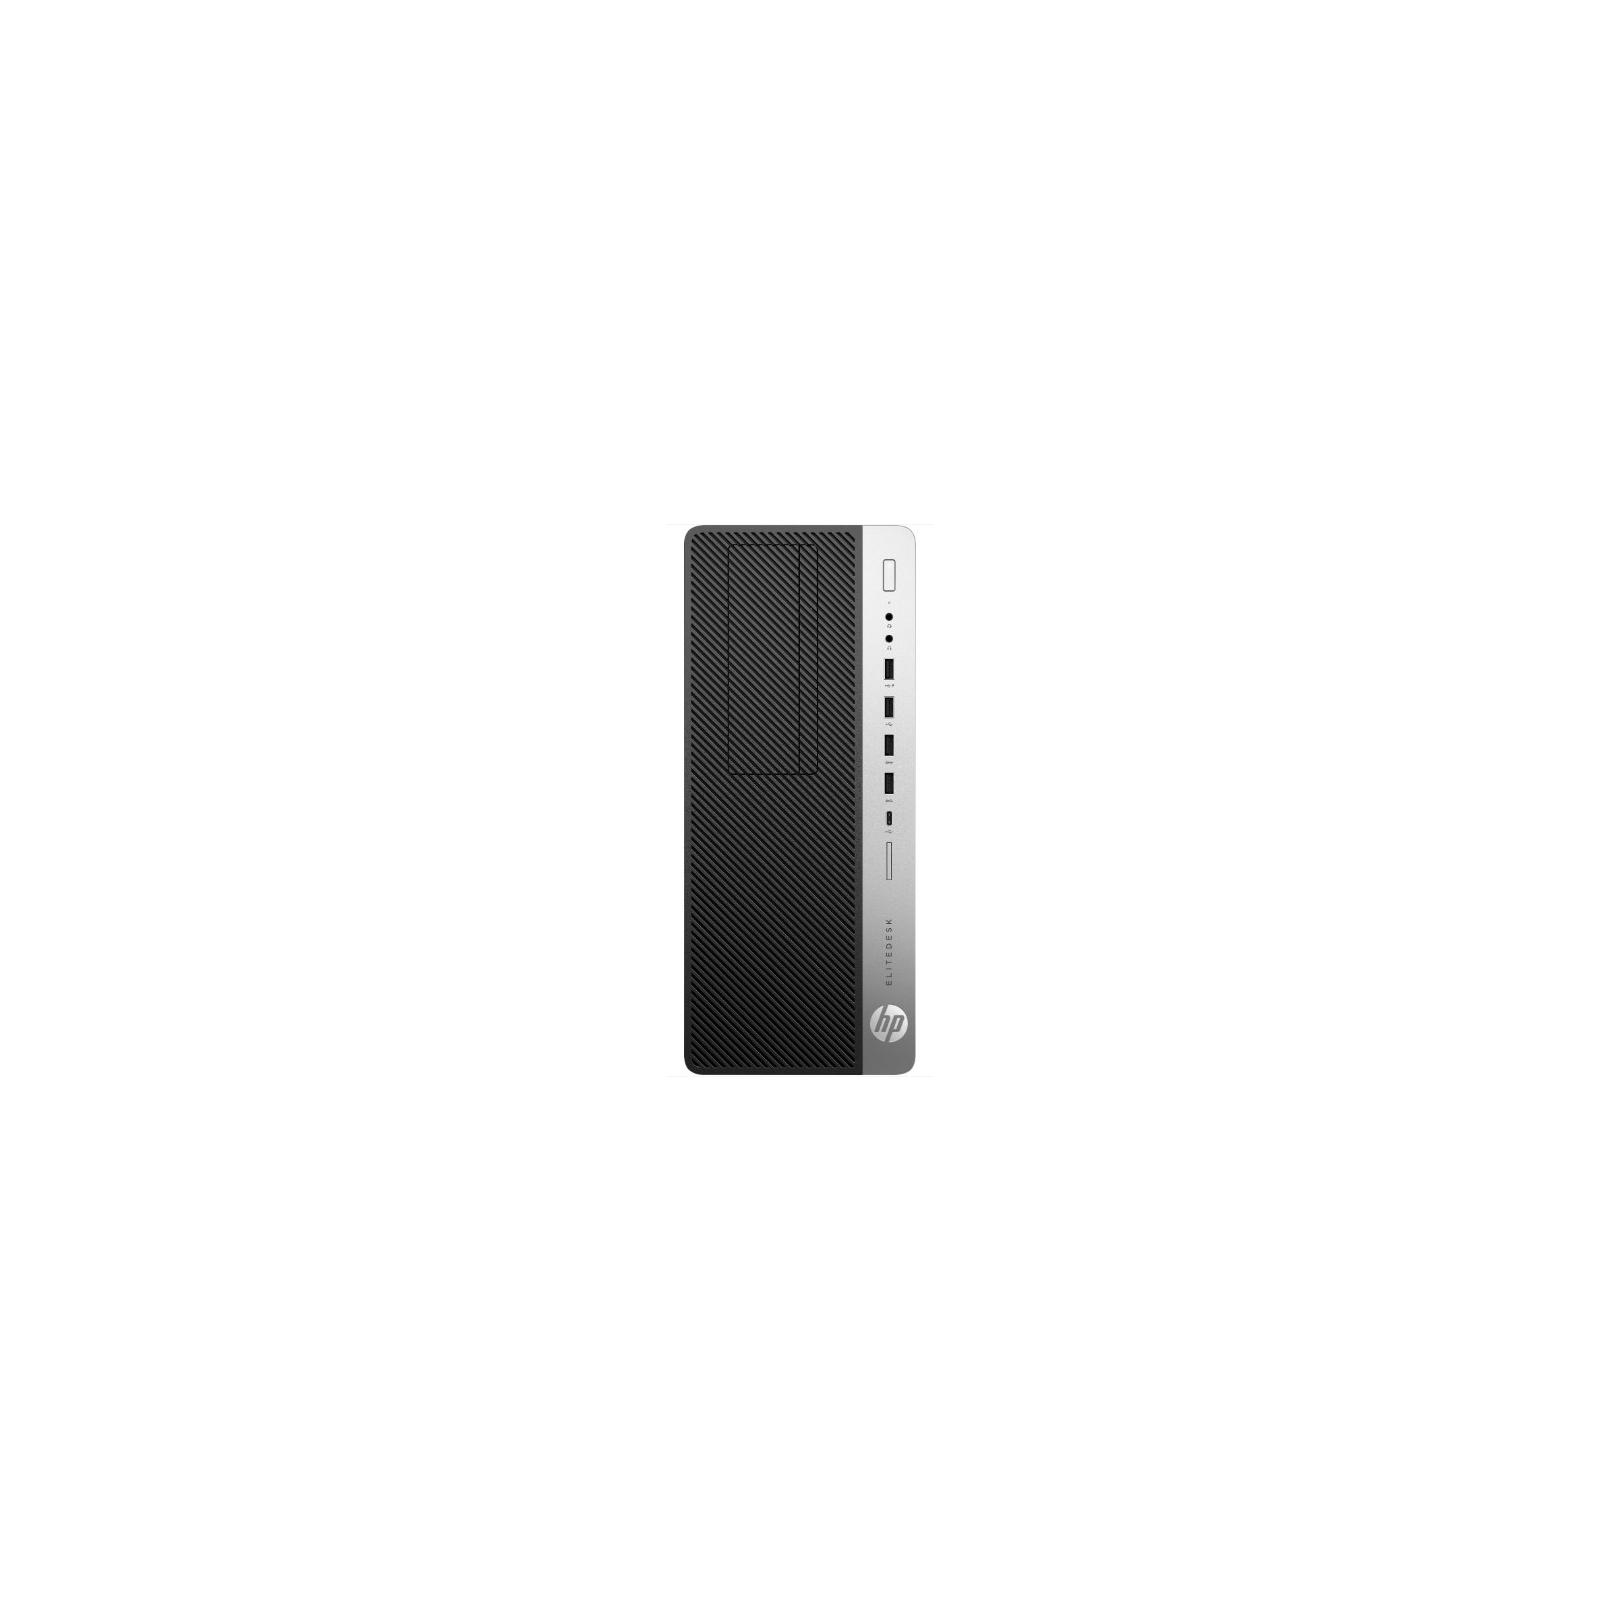 Компьютер HP EliteDesk 800 G5 TWR / i7-9700 (7QM90EA)